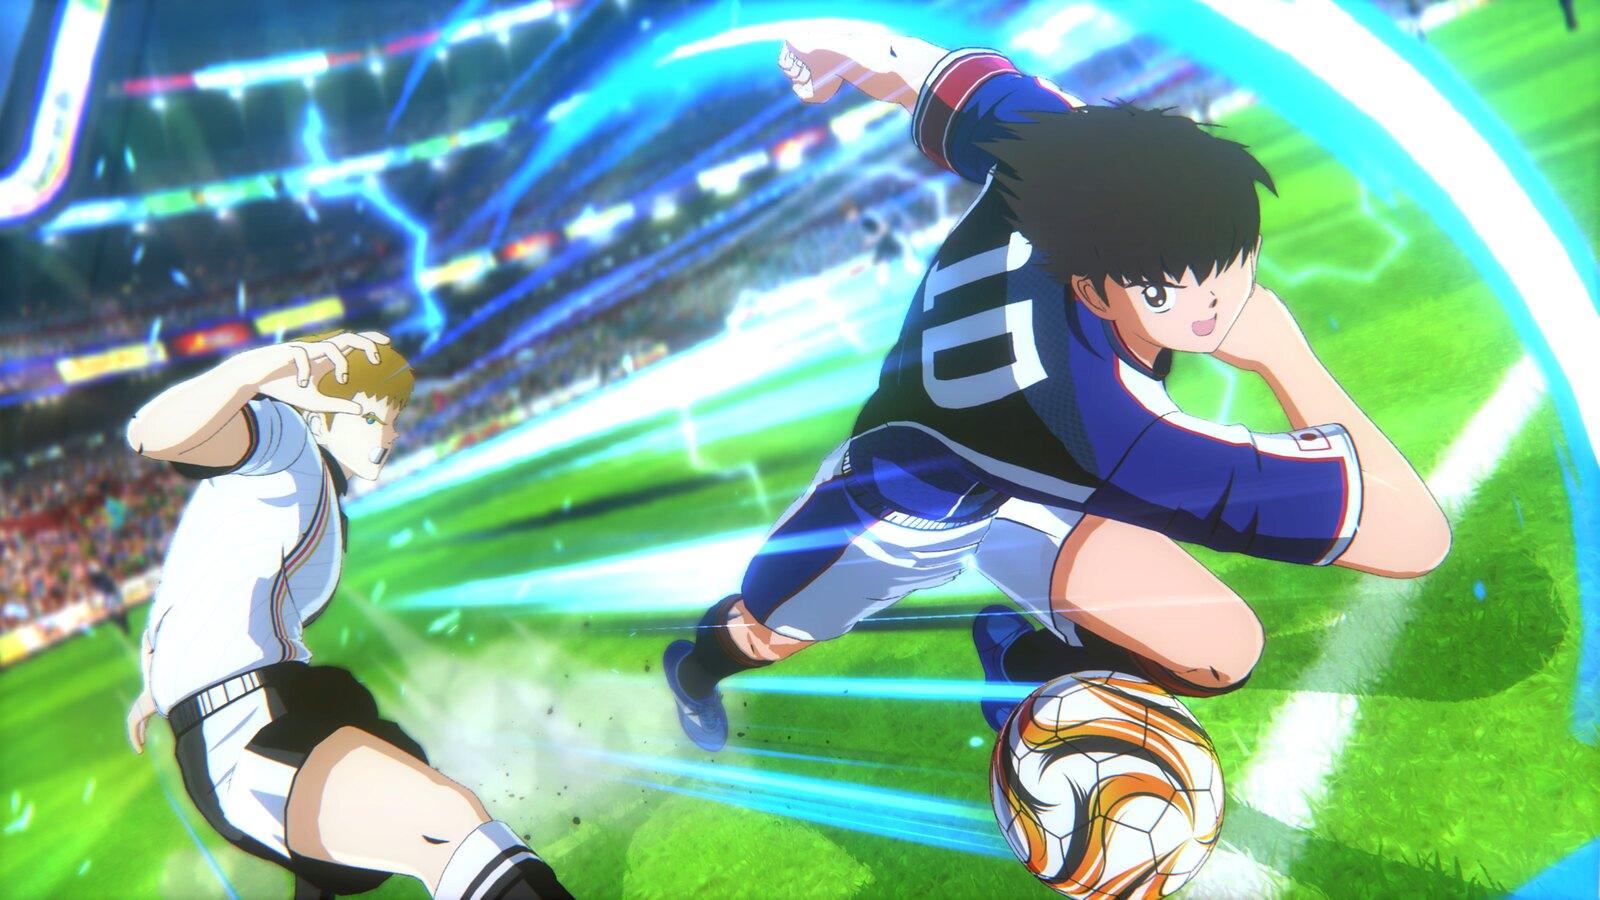 49434668516 6edb7a8b2c h - Captain Tsubasa: Rise of new Champions bringt Arcade-Action ins Wohnzimmer